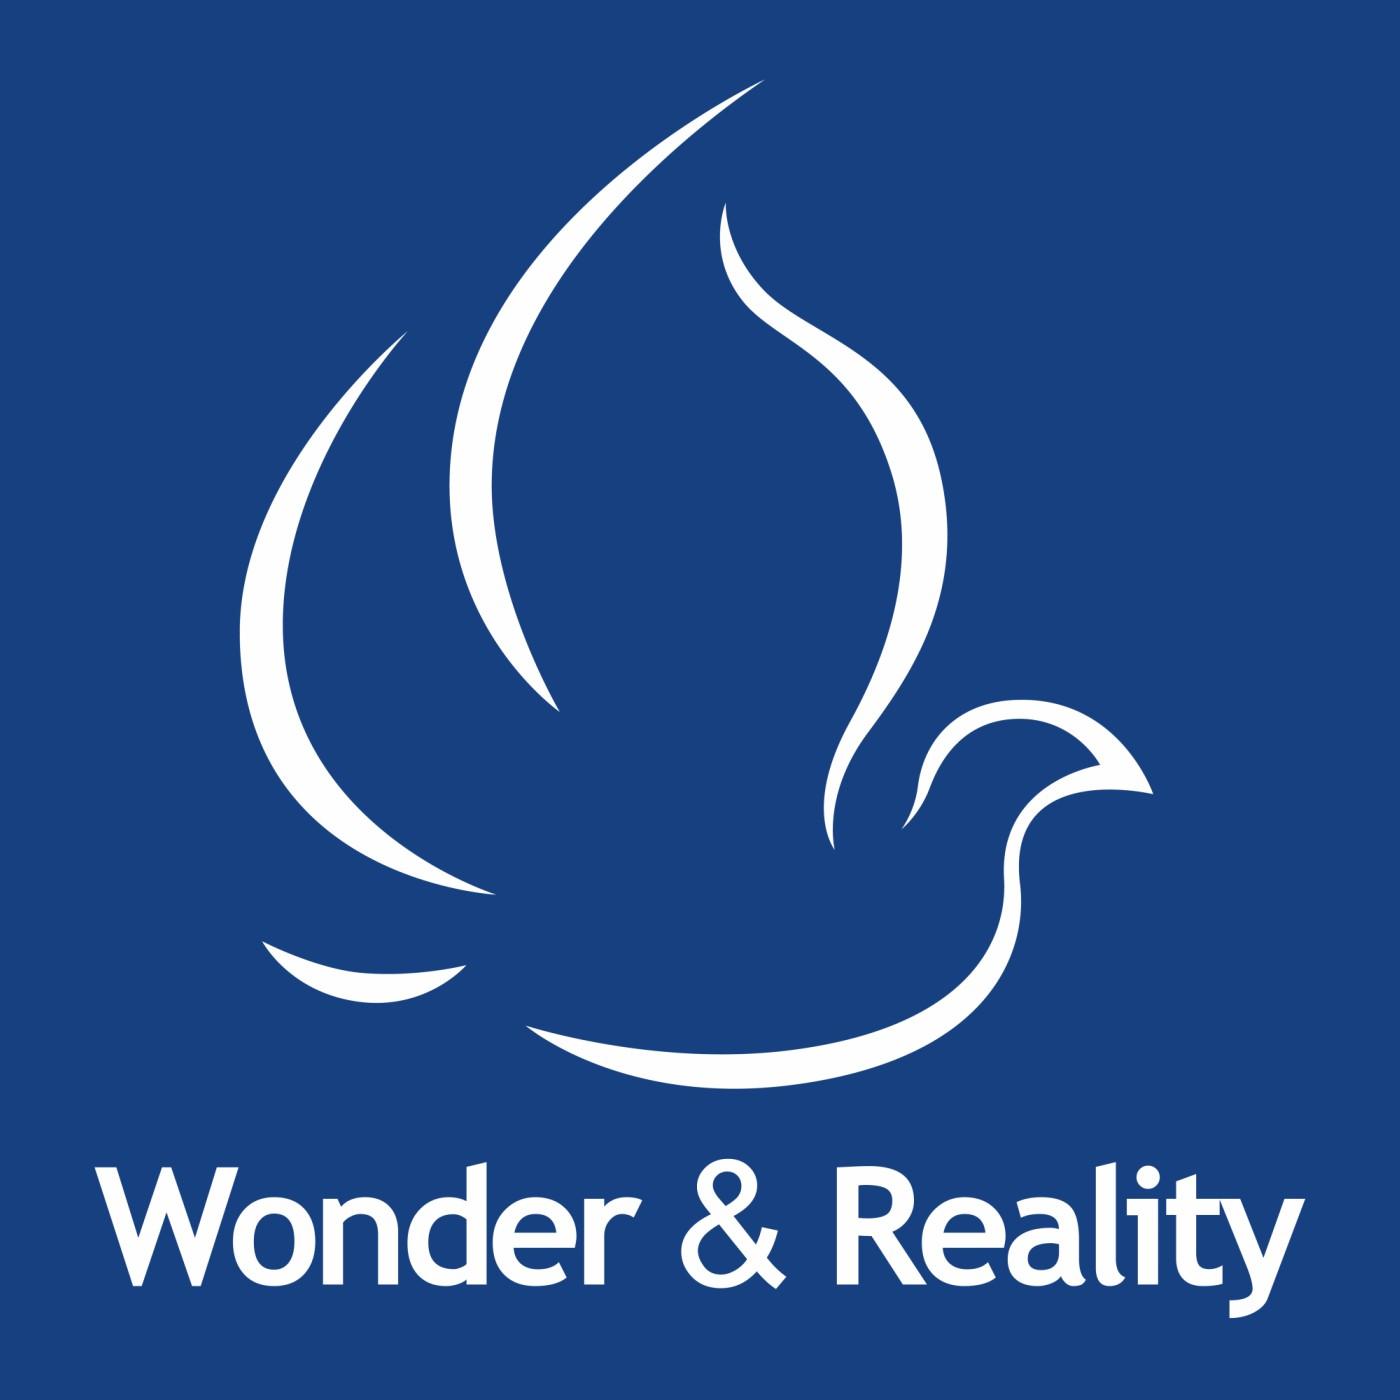 Wonder & Reality